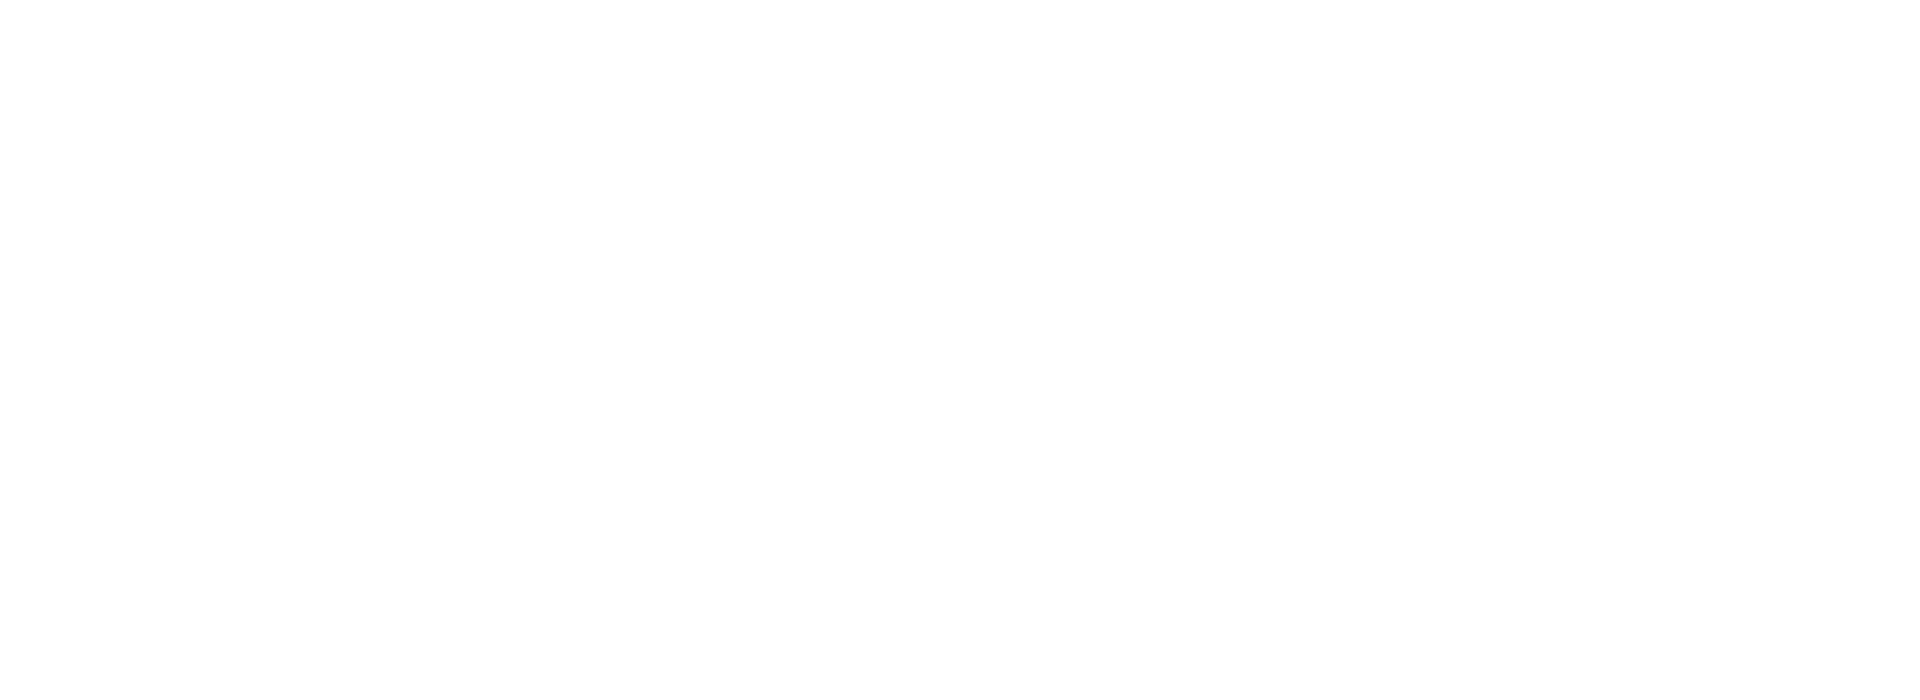 popular-mathematics-banner-diane-haffoss-background